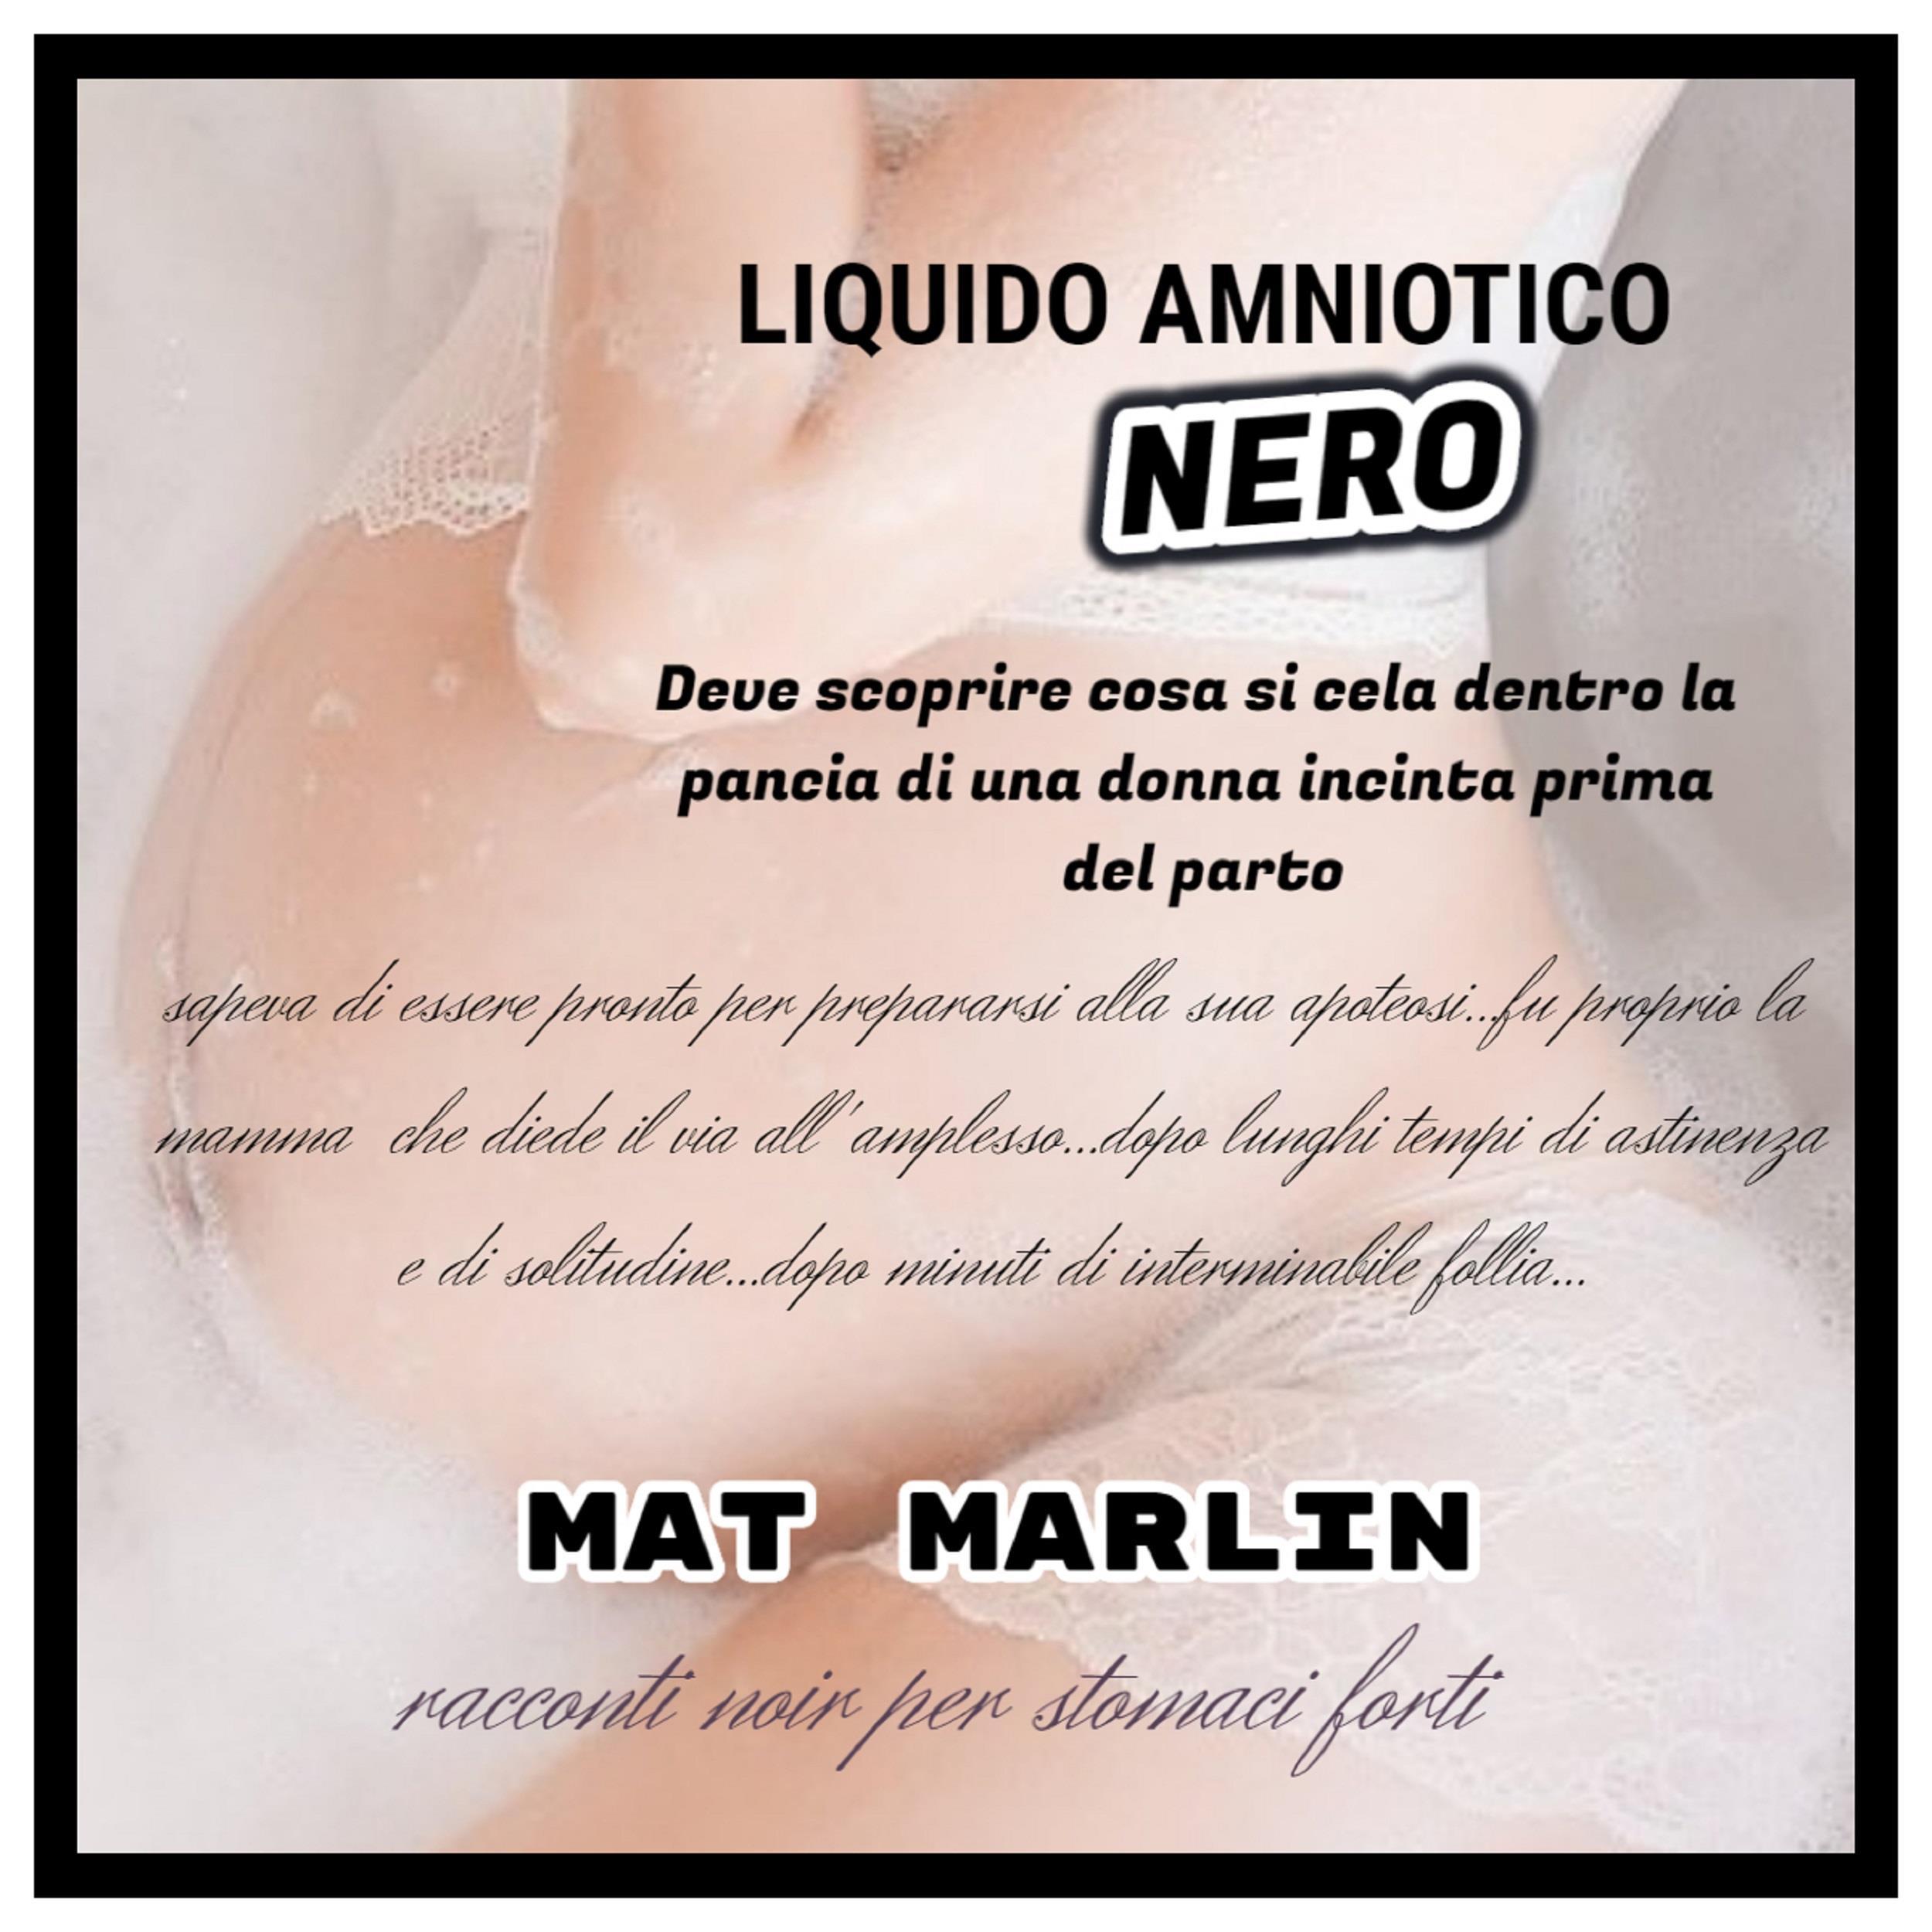 Liquido amniotico nero [Mat Marlin]